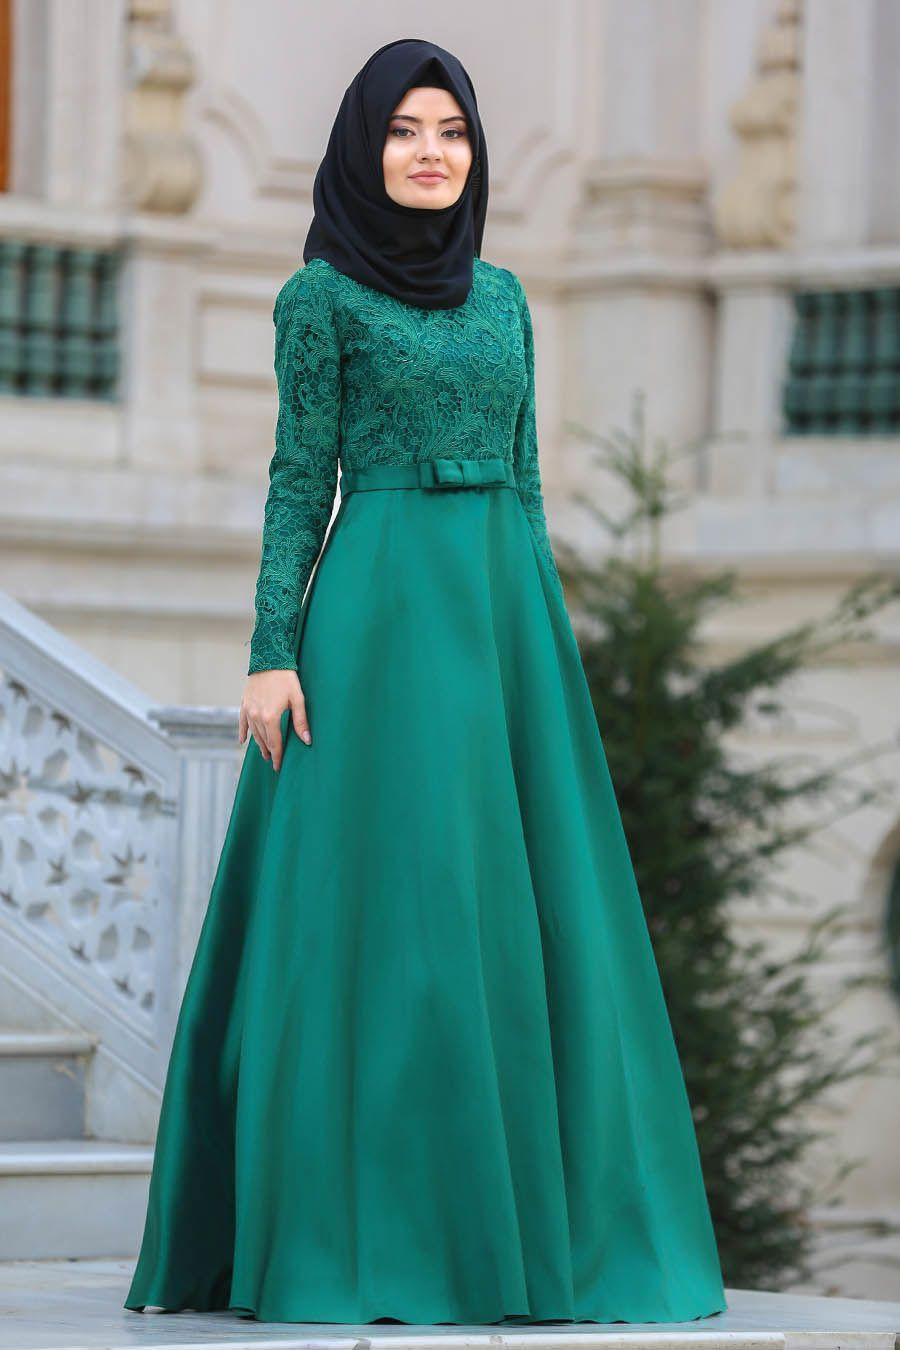 Tuay Mikado Saten Yesil Tesettur Abiye Elbise 23720y Tesetturisland Tesettur Tesetturelbise Tesettu Pakaian Wanita Model Pakaian Muslim Model Baju Wanita